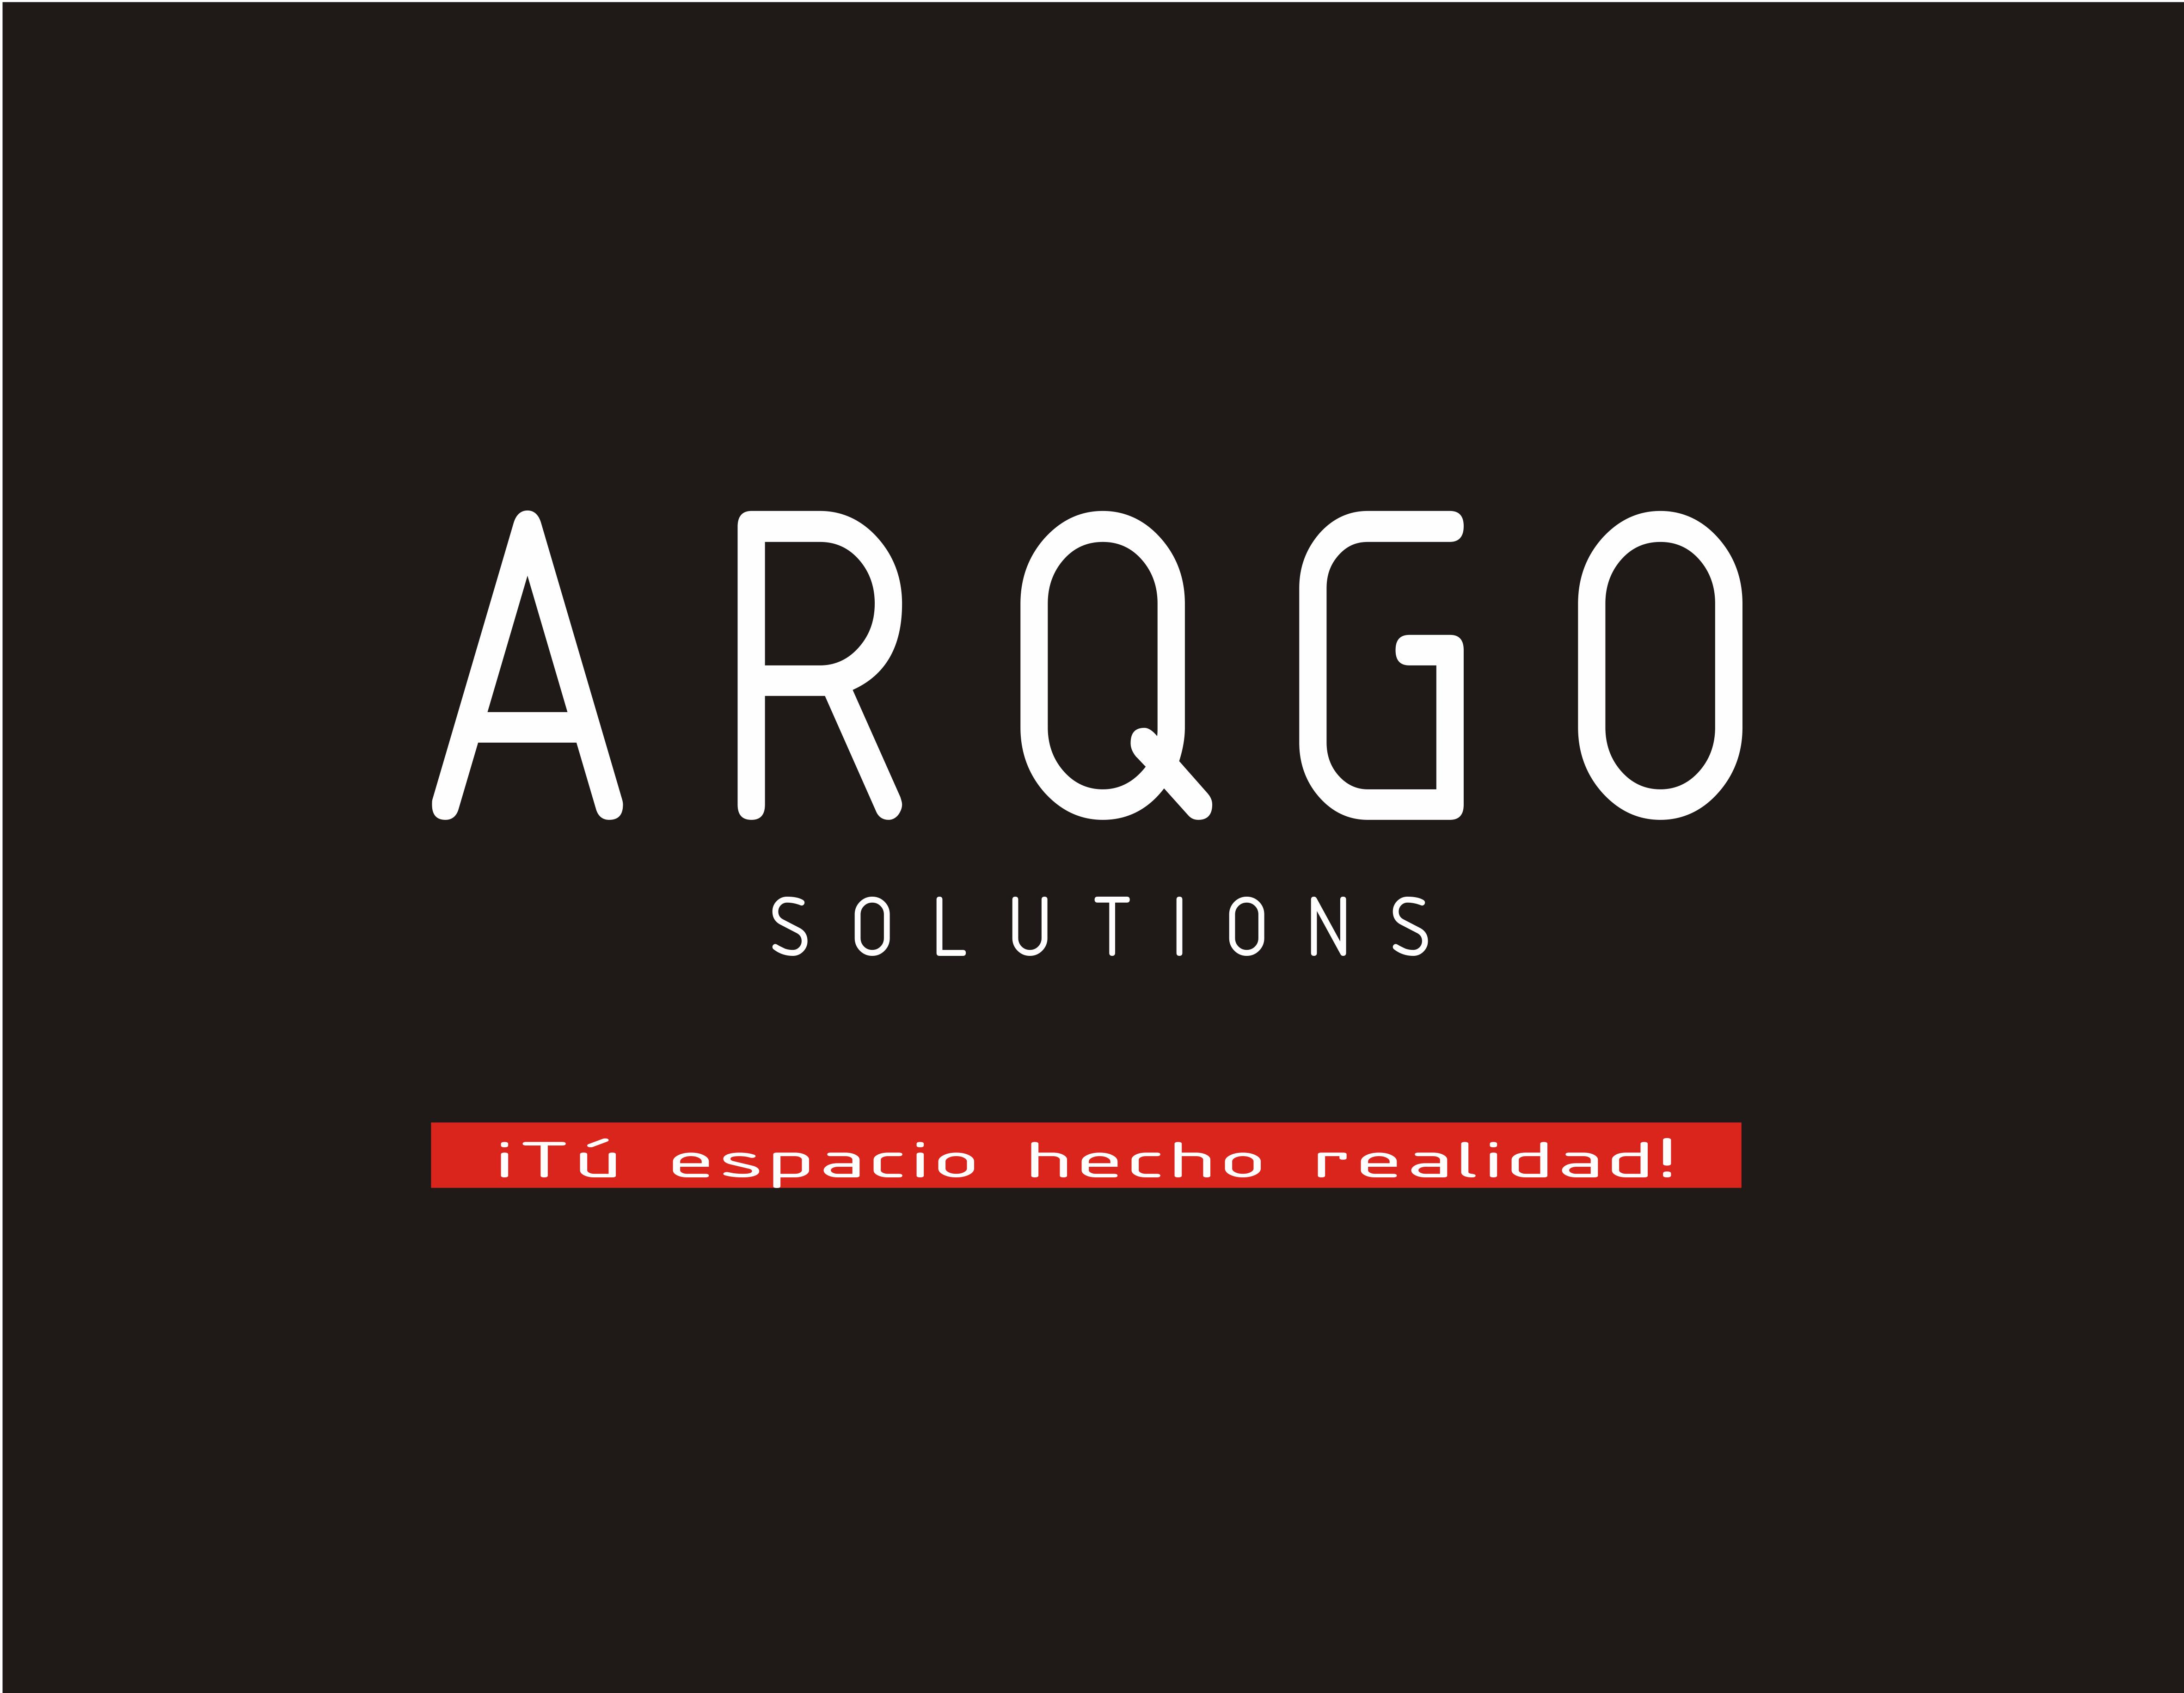 Arqgo Solutions